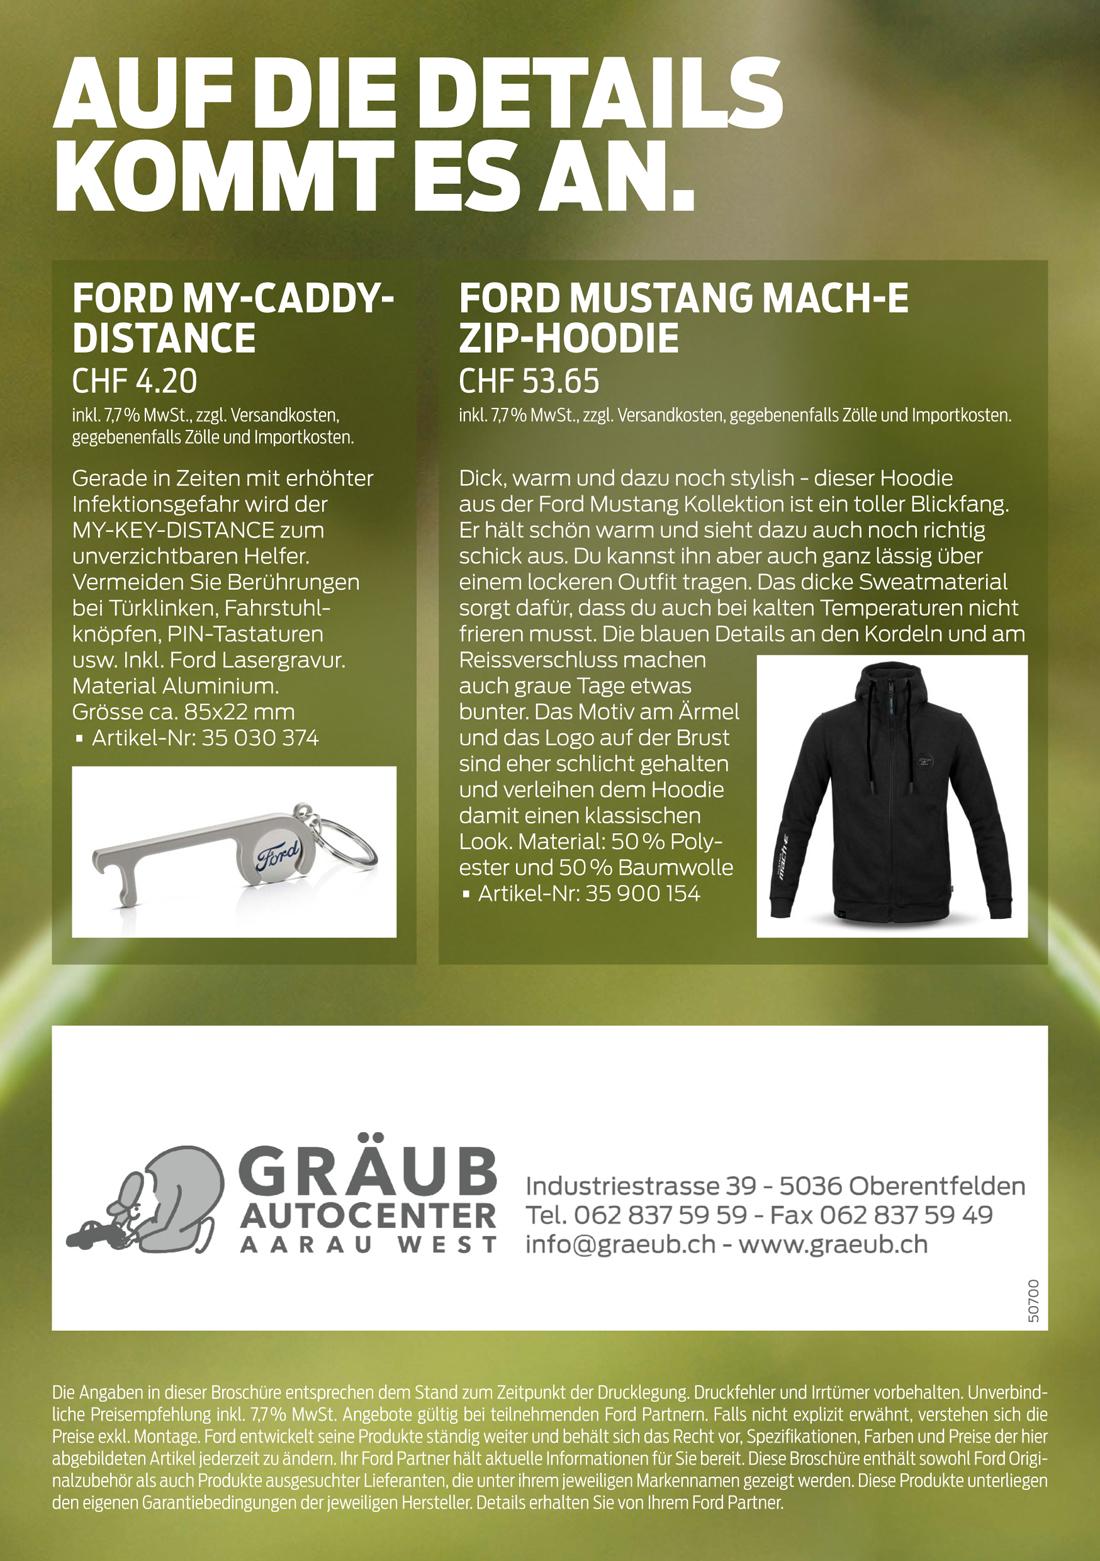 2021-Ford_Fruehlingskampagne_Broschuere-Seite-8a-2021-03-02.jpg#asset:724